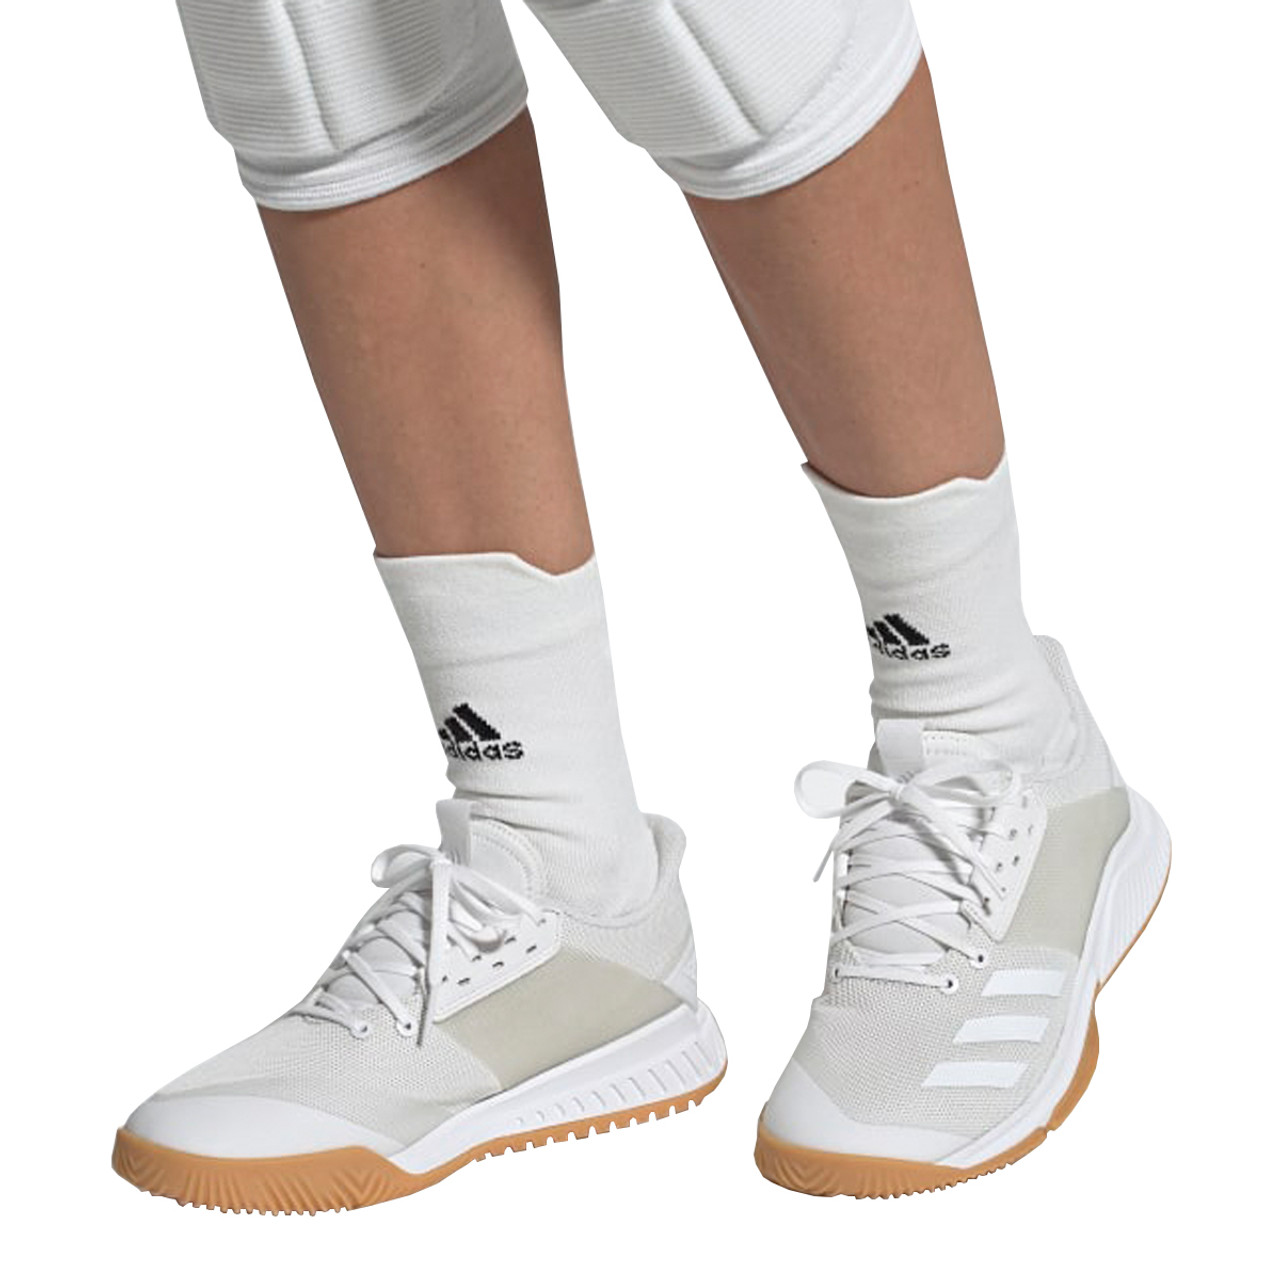 Adidas Crazyflight Team Women's Volleyball Shoes D97700 White, Gum